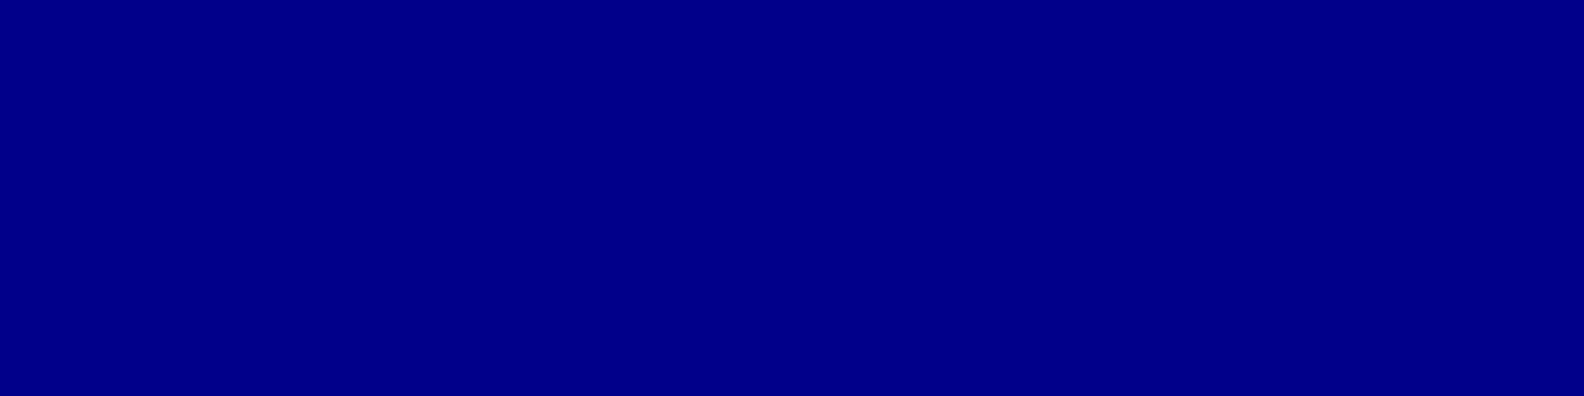 1584x396 Dark Blue Solid Color Background